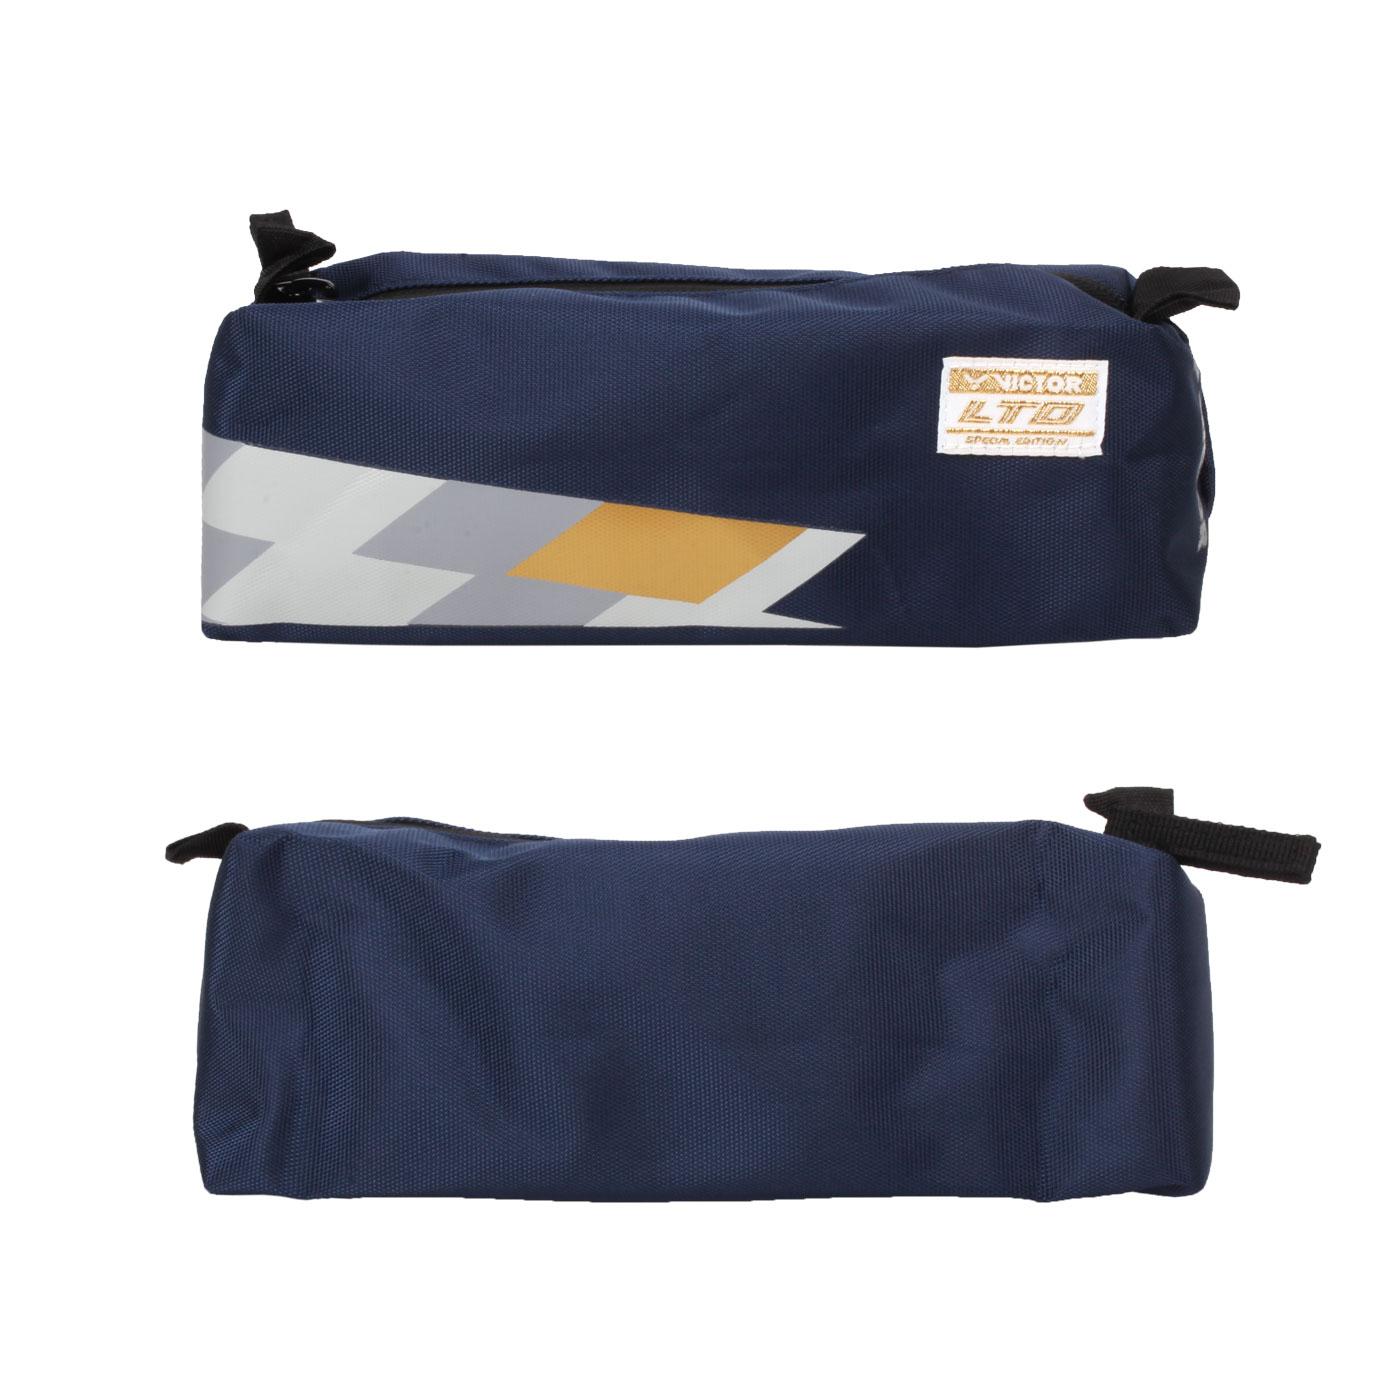 VICTOR 2020奧運系列鉛筆袋 PG8810LTDAB - 丈青灰金